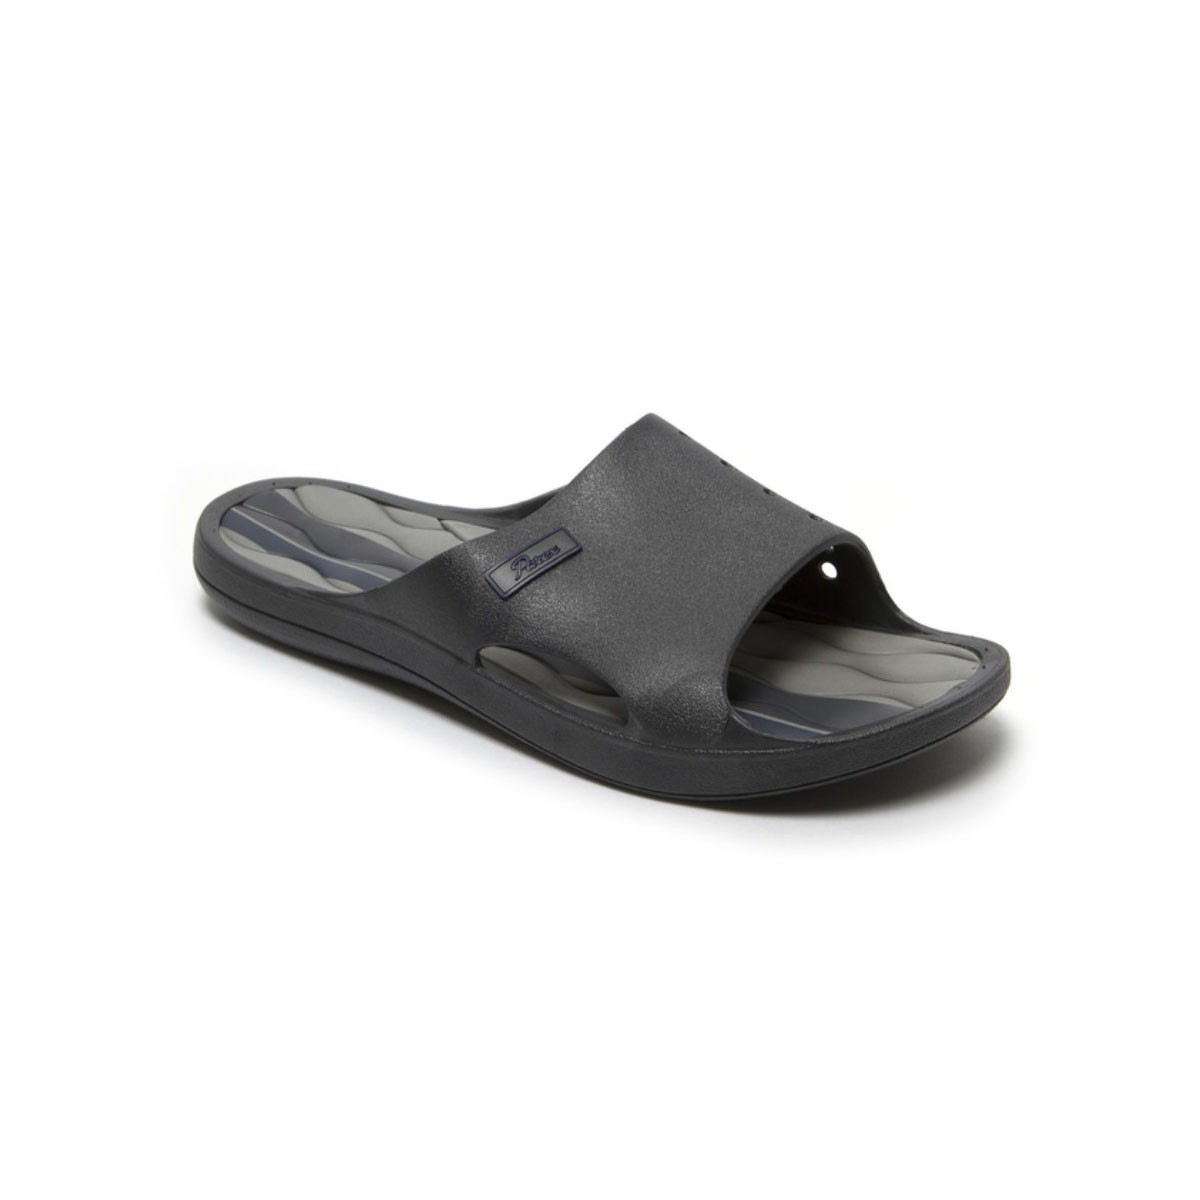 4c361062156 Parex Ανδρικές Παντόφλες YU17451 Γκρι |Γυναικεία & Ανδρικά Παπούτσια ...